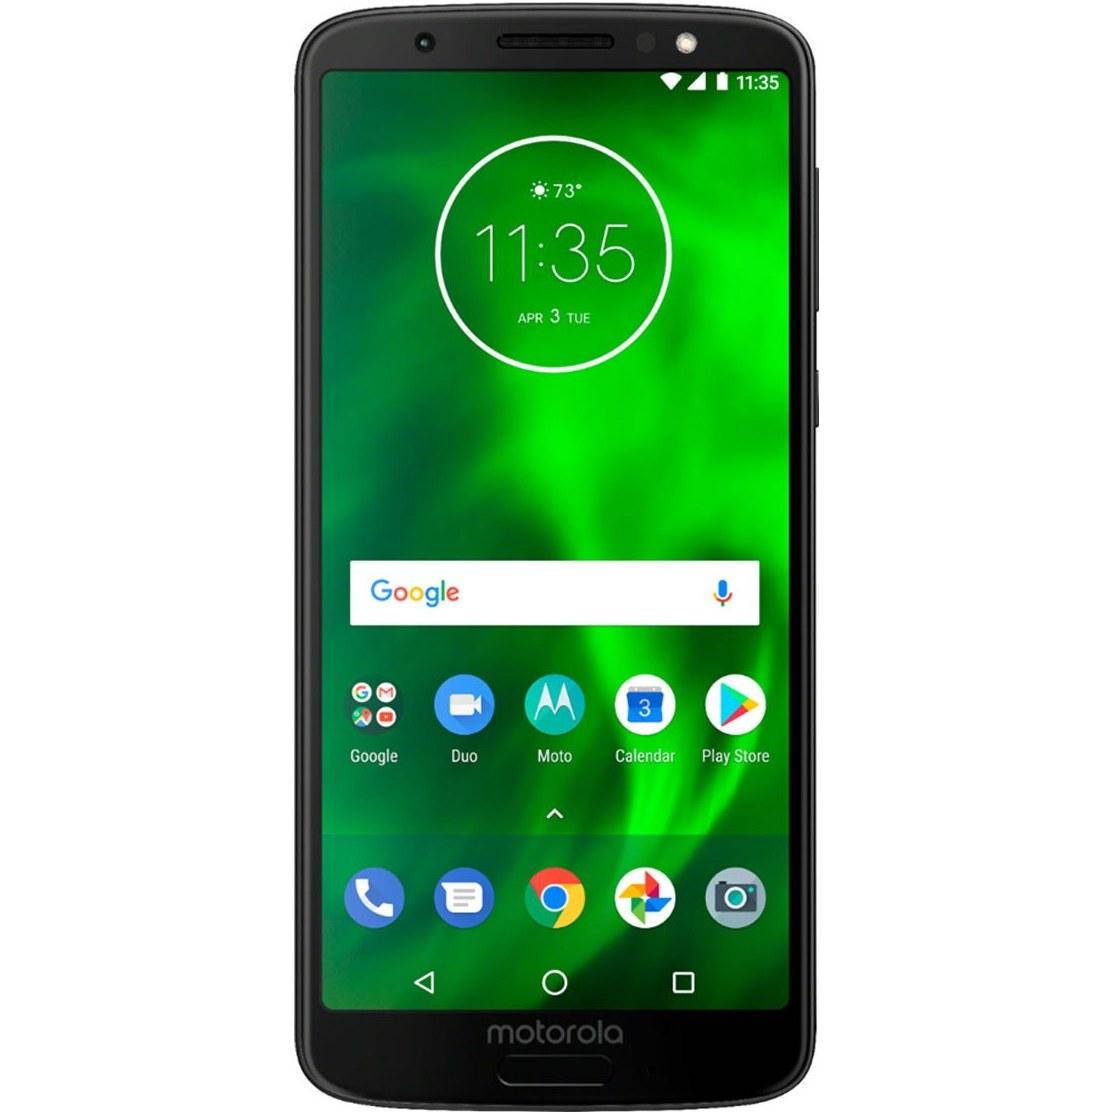 Motorola Moto G6 | 64GB | گوشی موتورولا موتو جی 6 | ظرفیت 64 گیگابایت